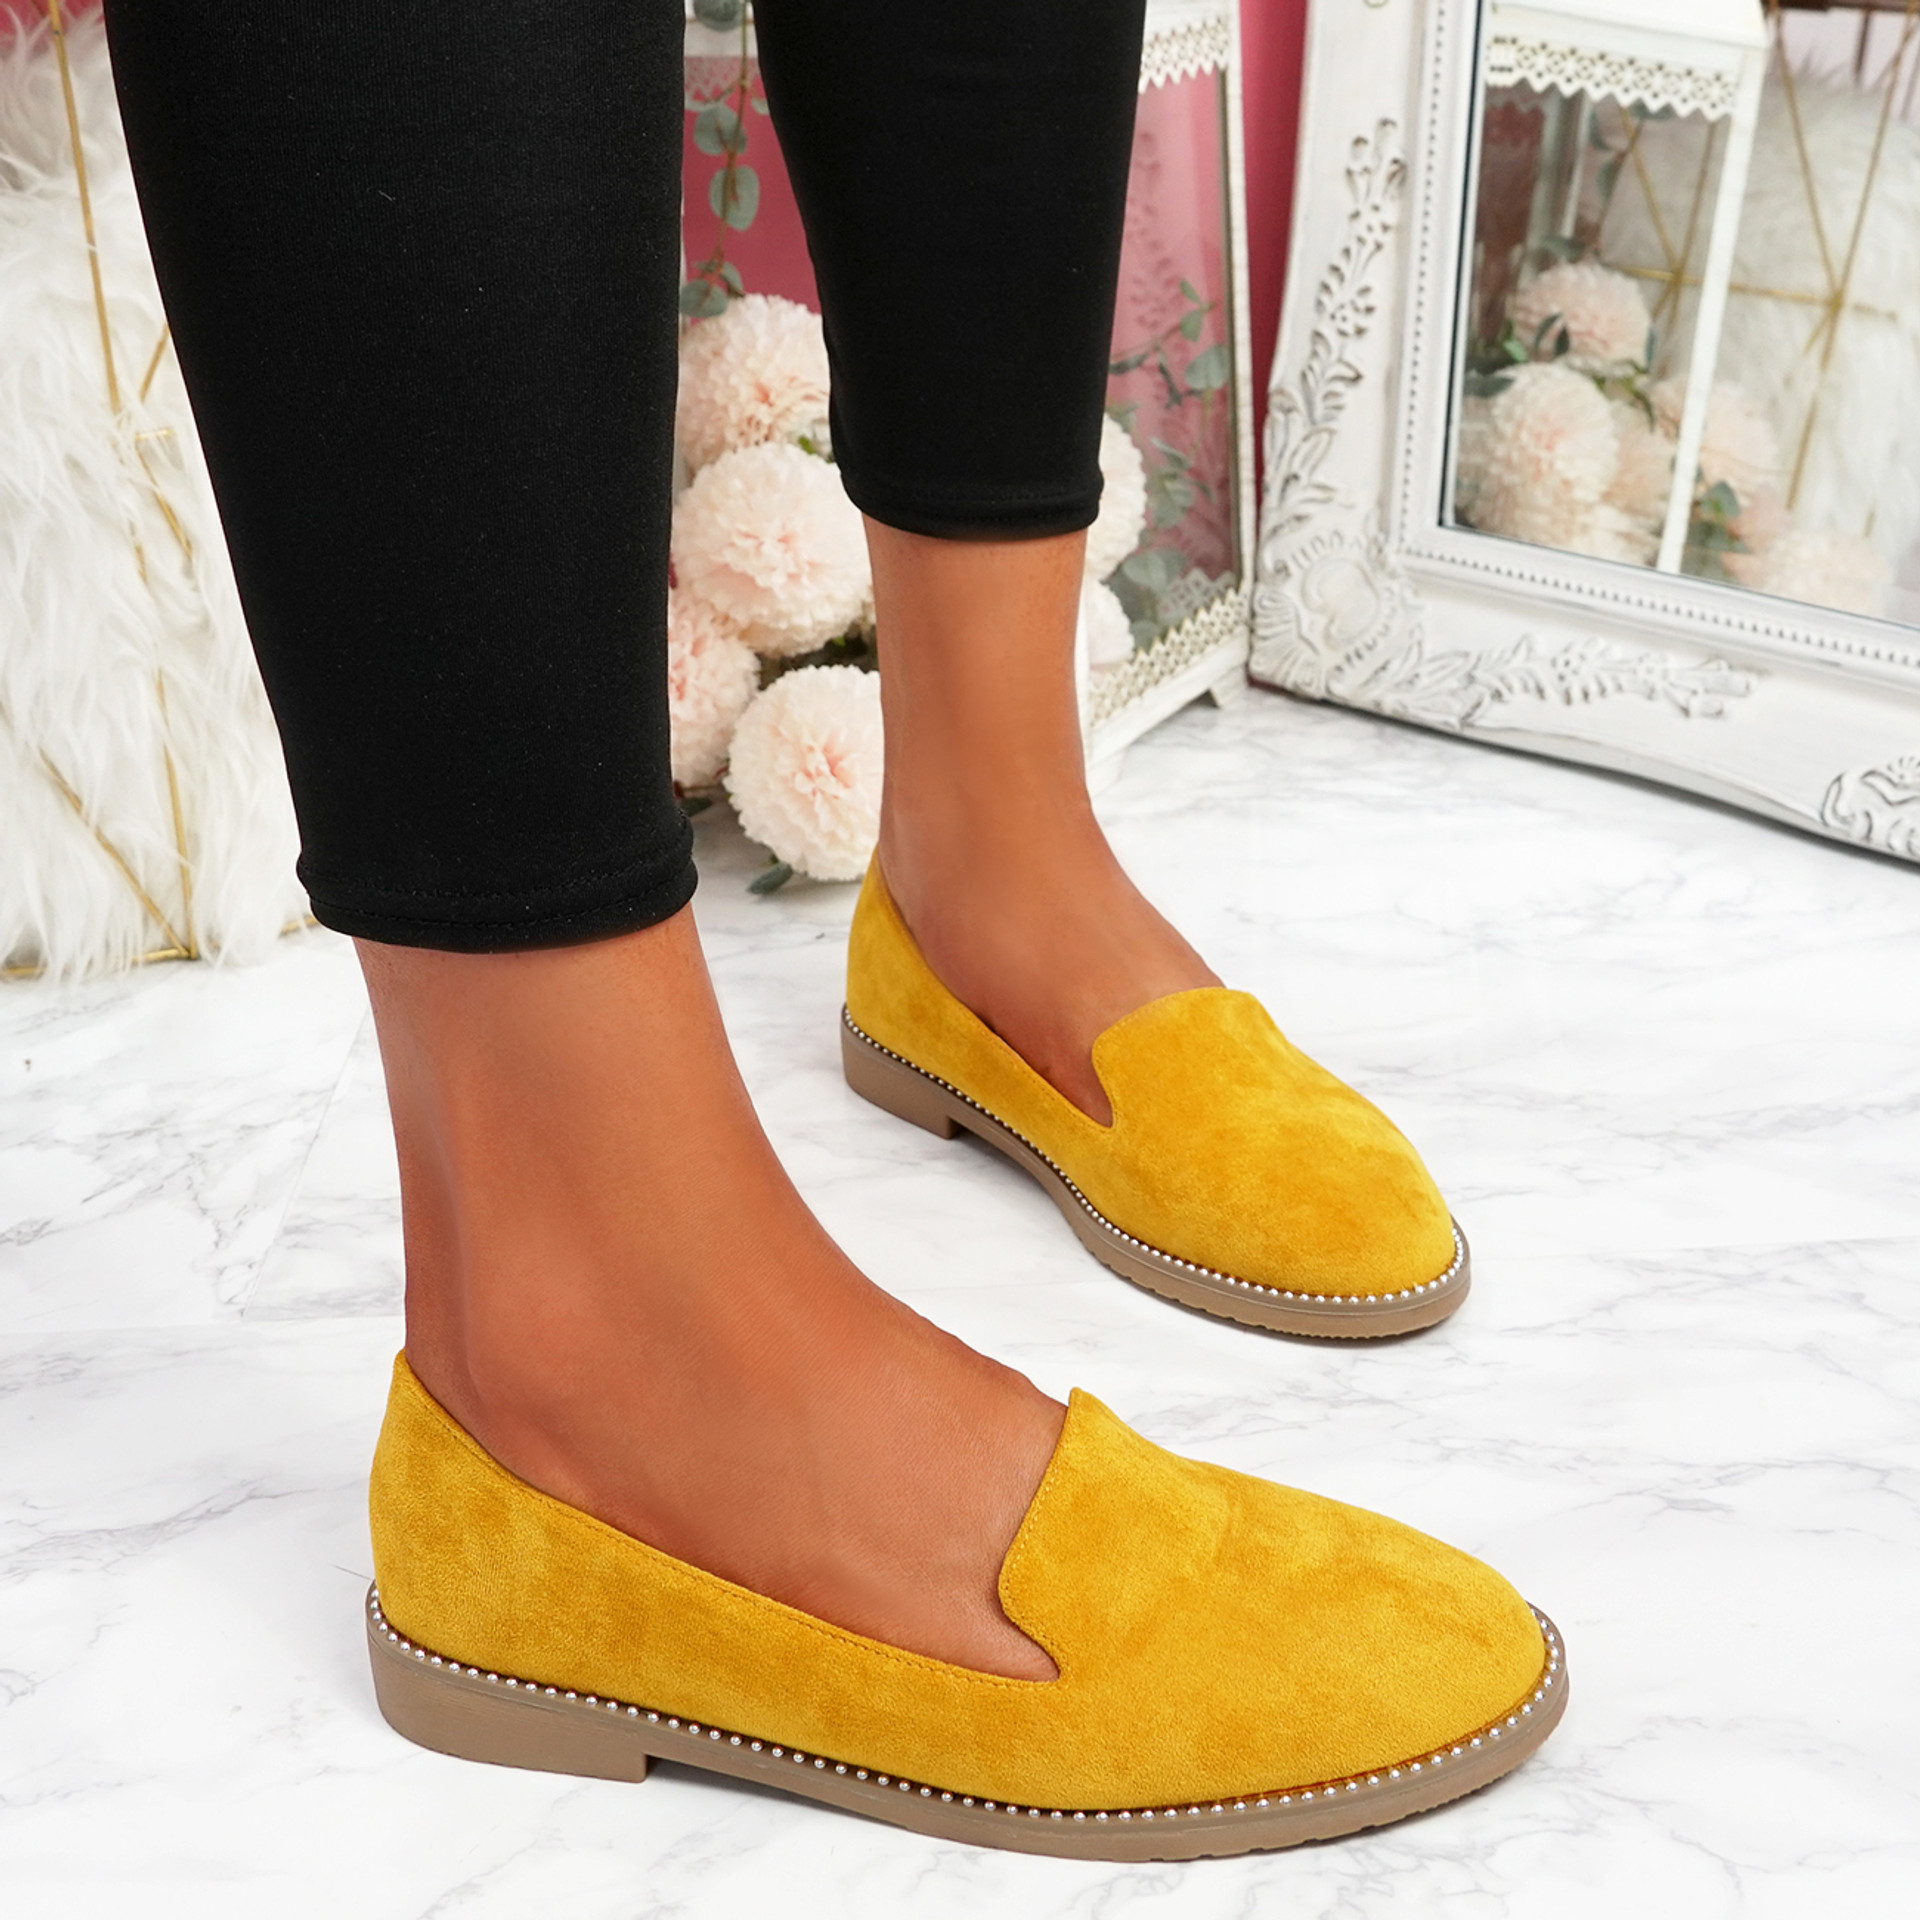 Grety Yellow Studded Ballerinas